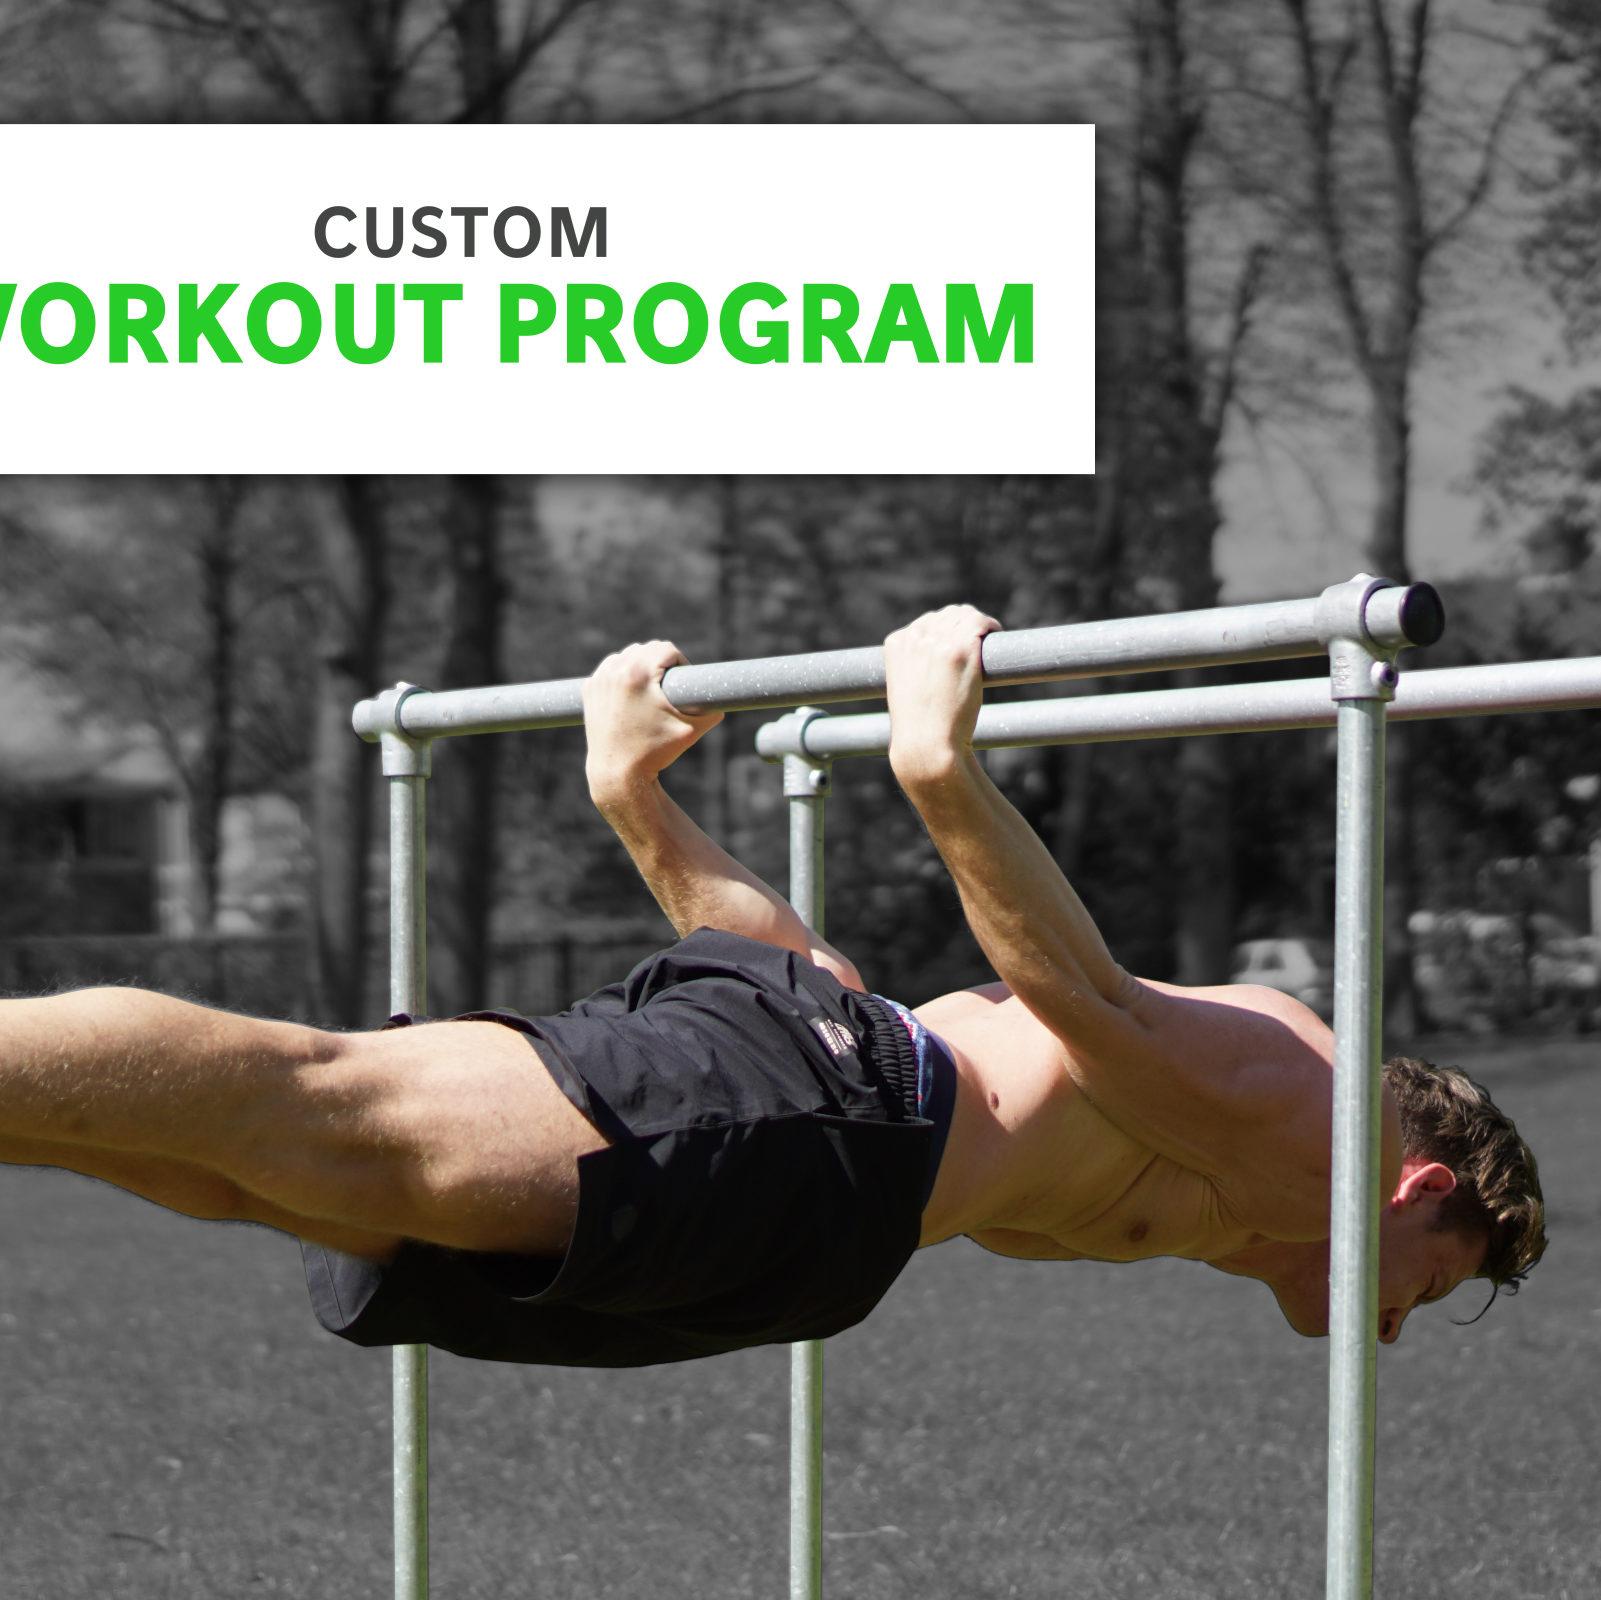 Costum workout program calisthenics